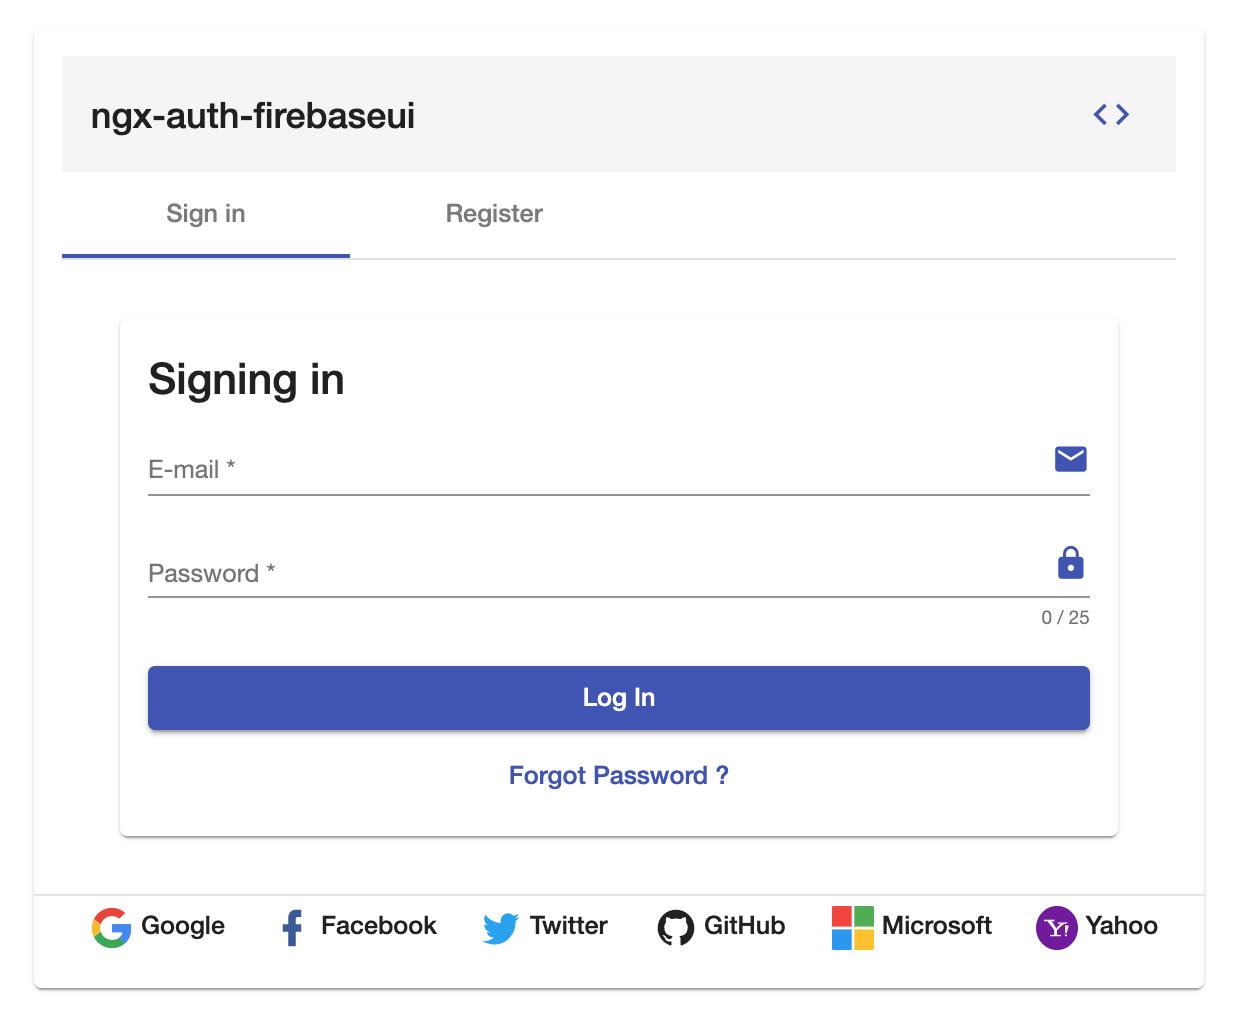 ngx-auth-firebaseui sign in